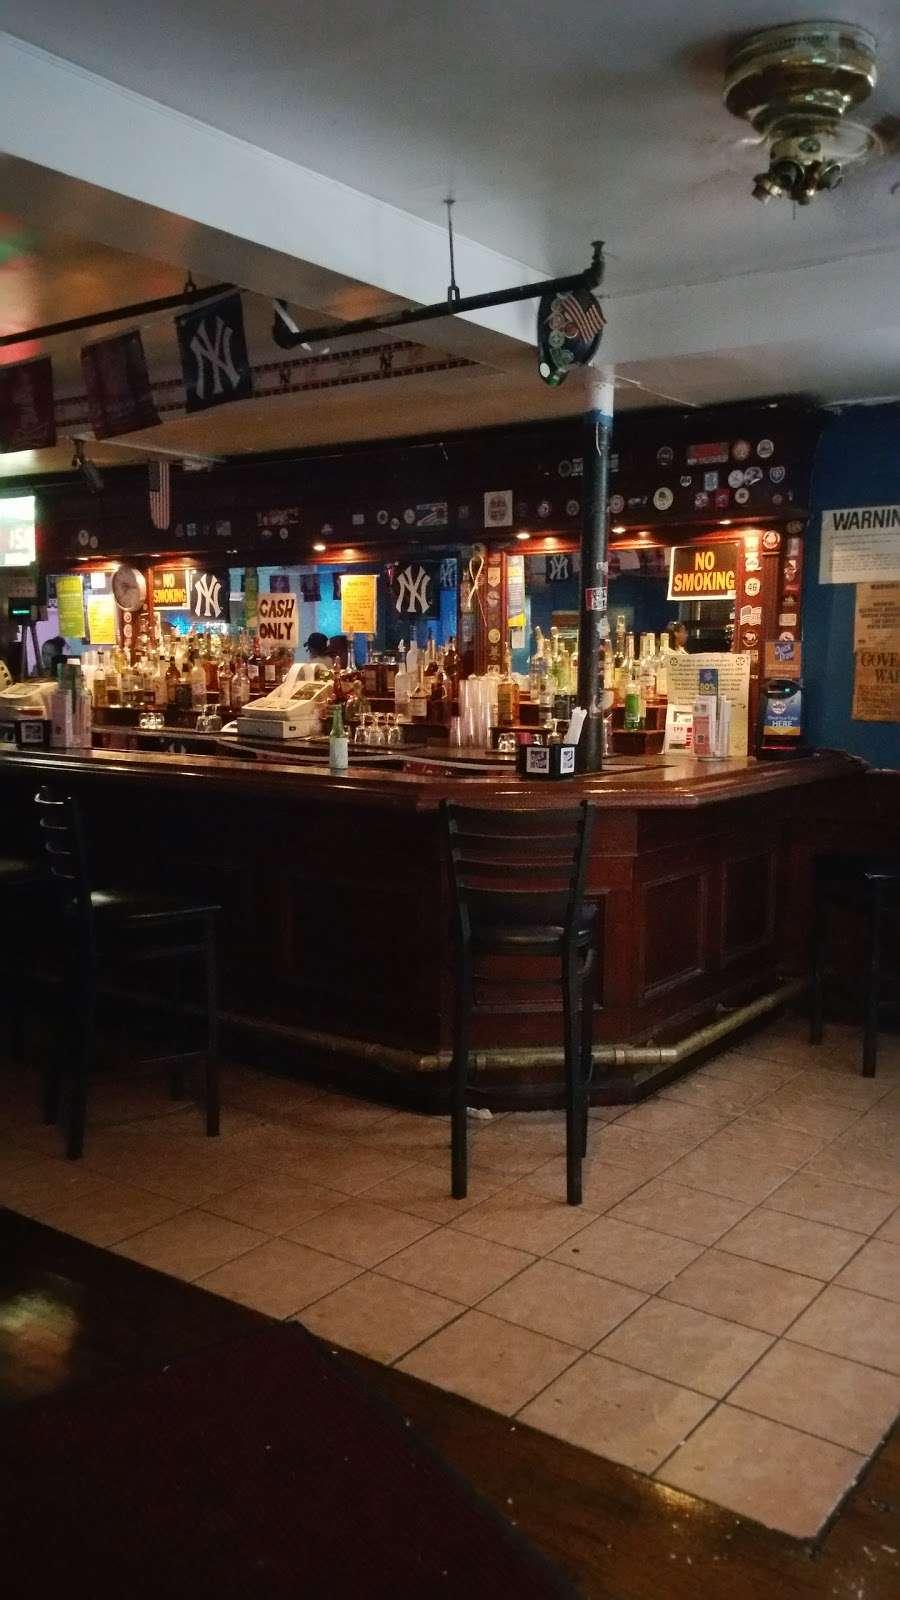 Woodlawn Cafe - cafe  | Photo 1 of 3 | Address: 3700 Jerome Ave, Bronx, NY 10467, USA